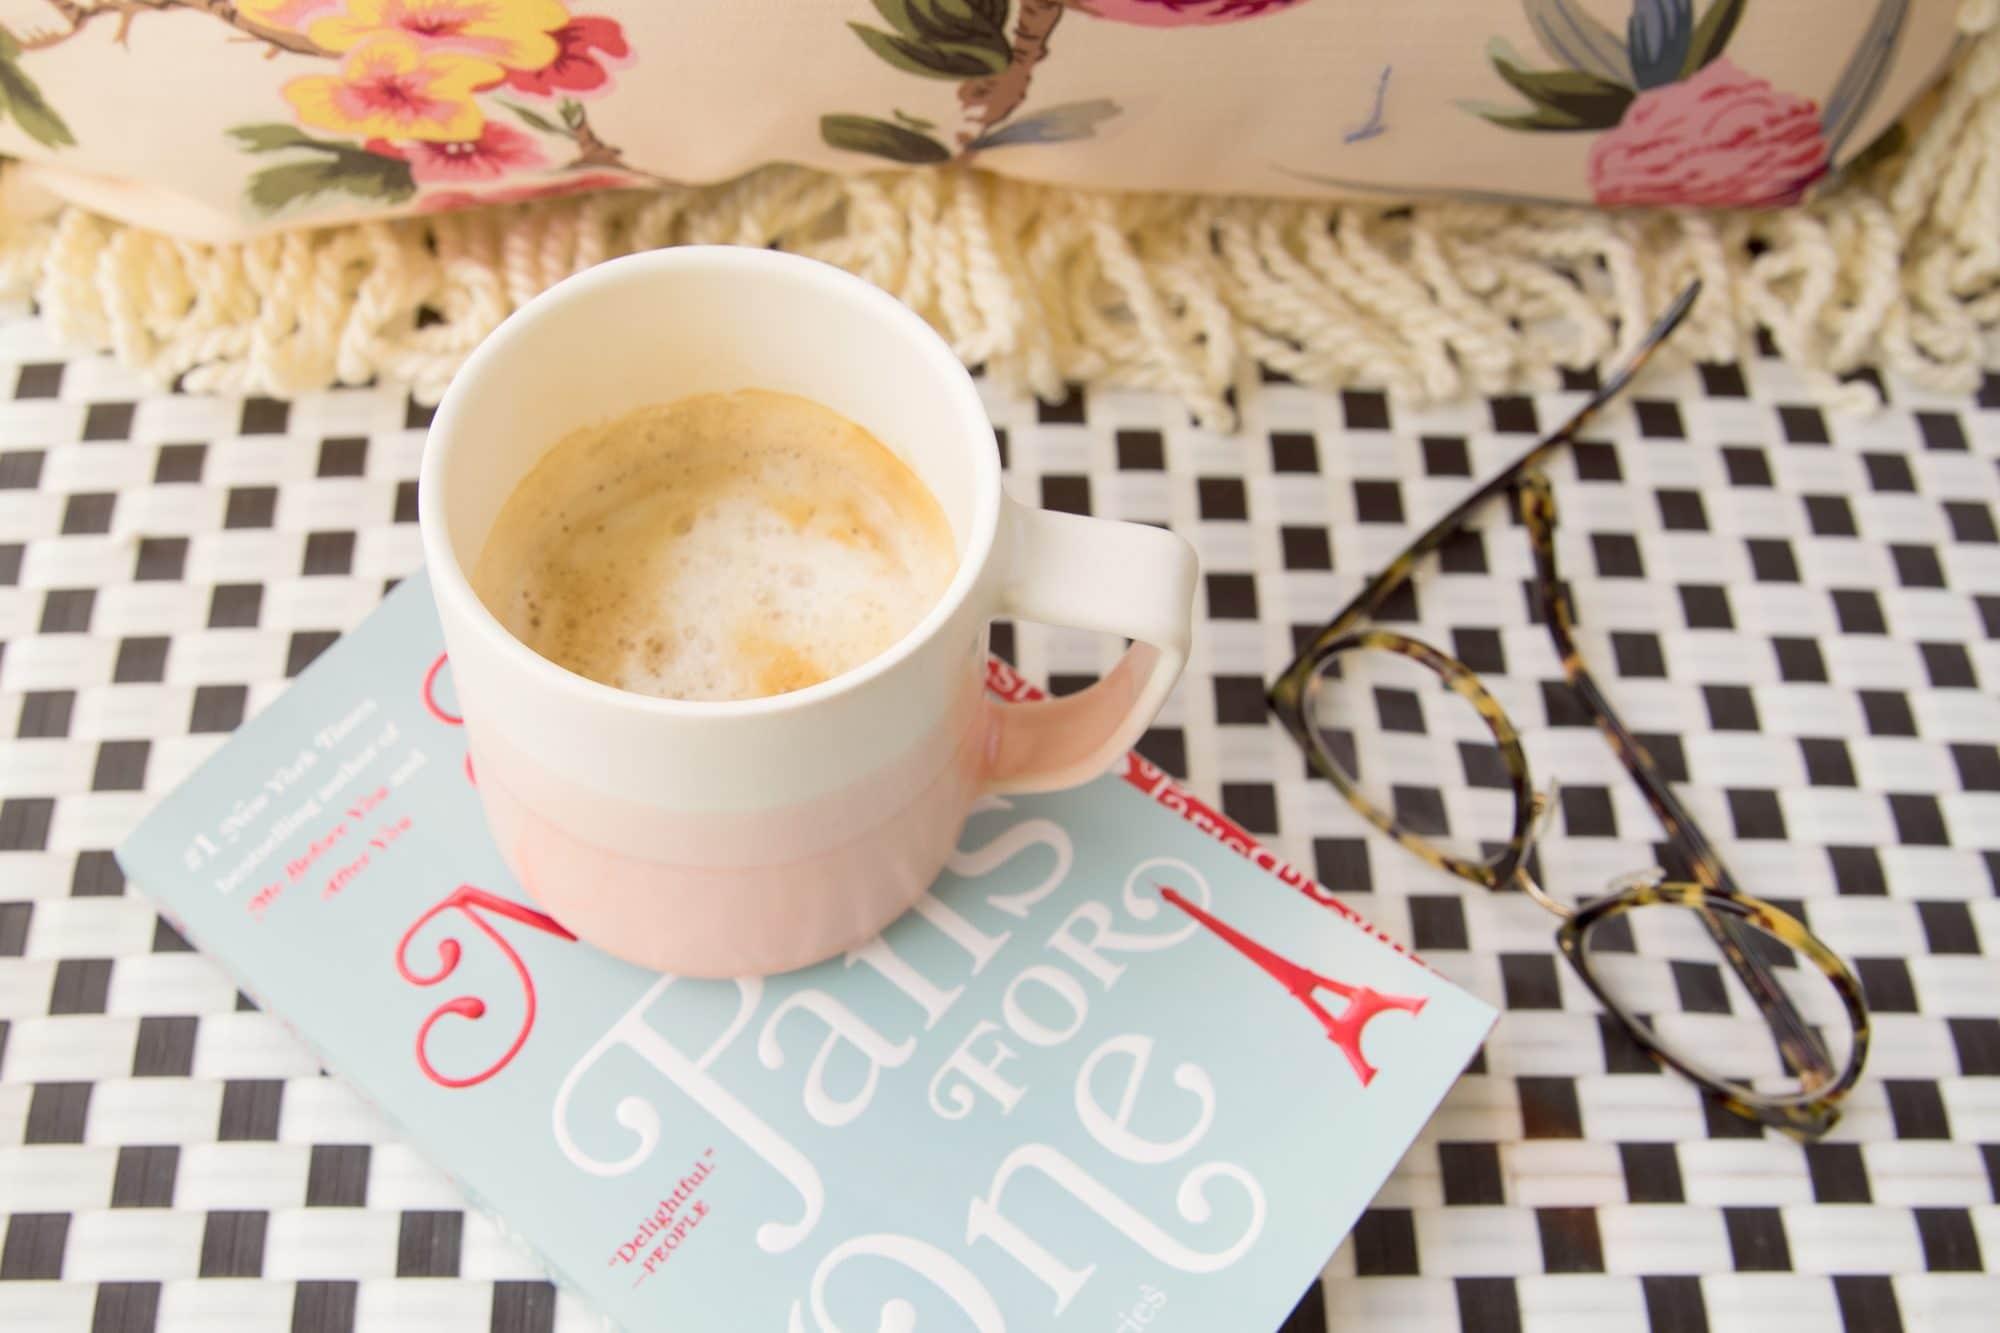 Ashley Brooke Designs - Paper & Clay Coffee Mug - Weekend Reading | www.ashleybrookedesigns.com